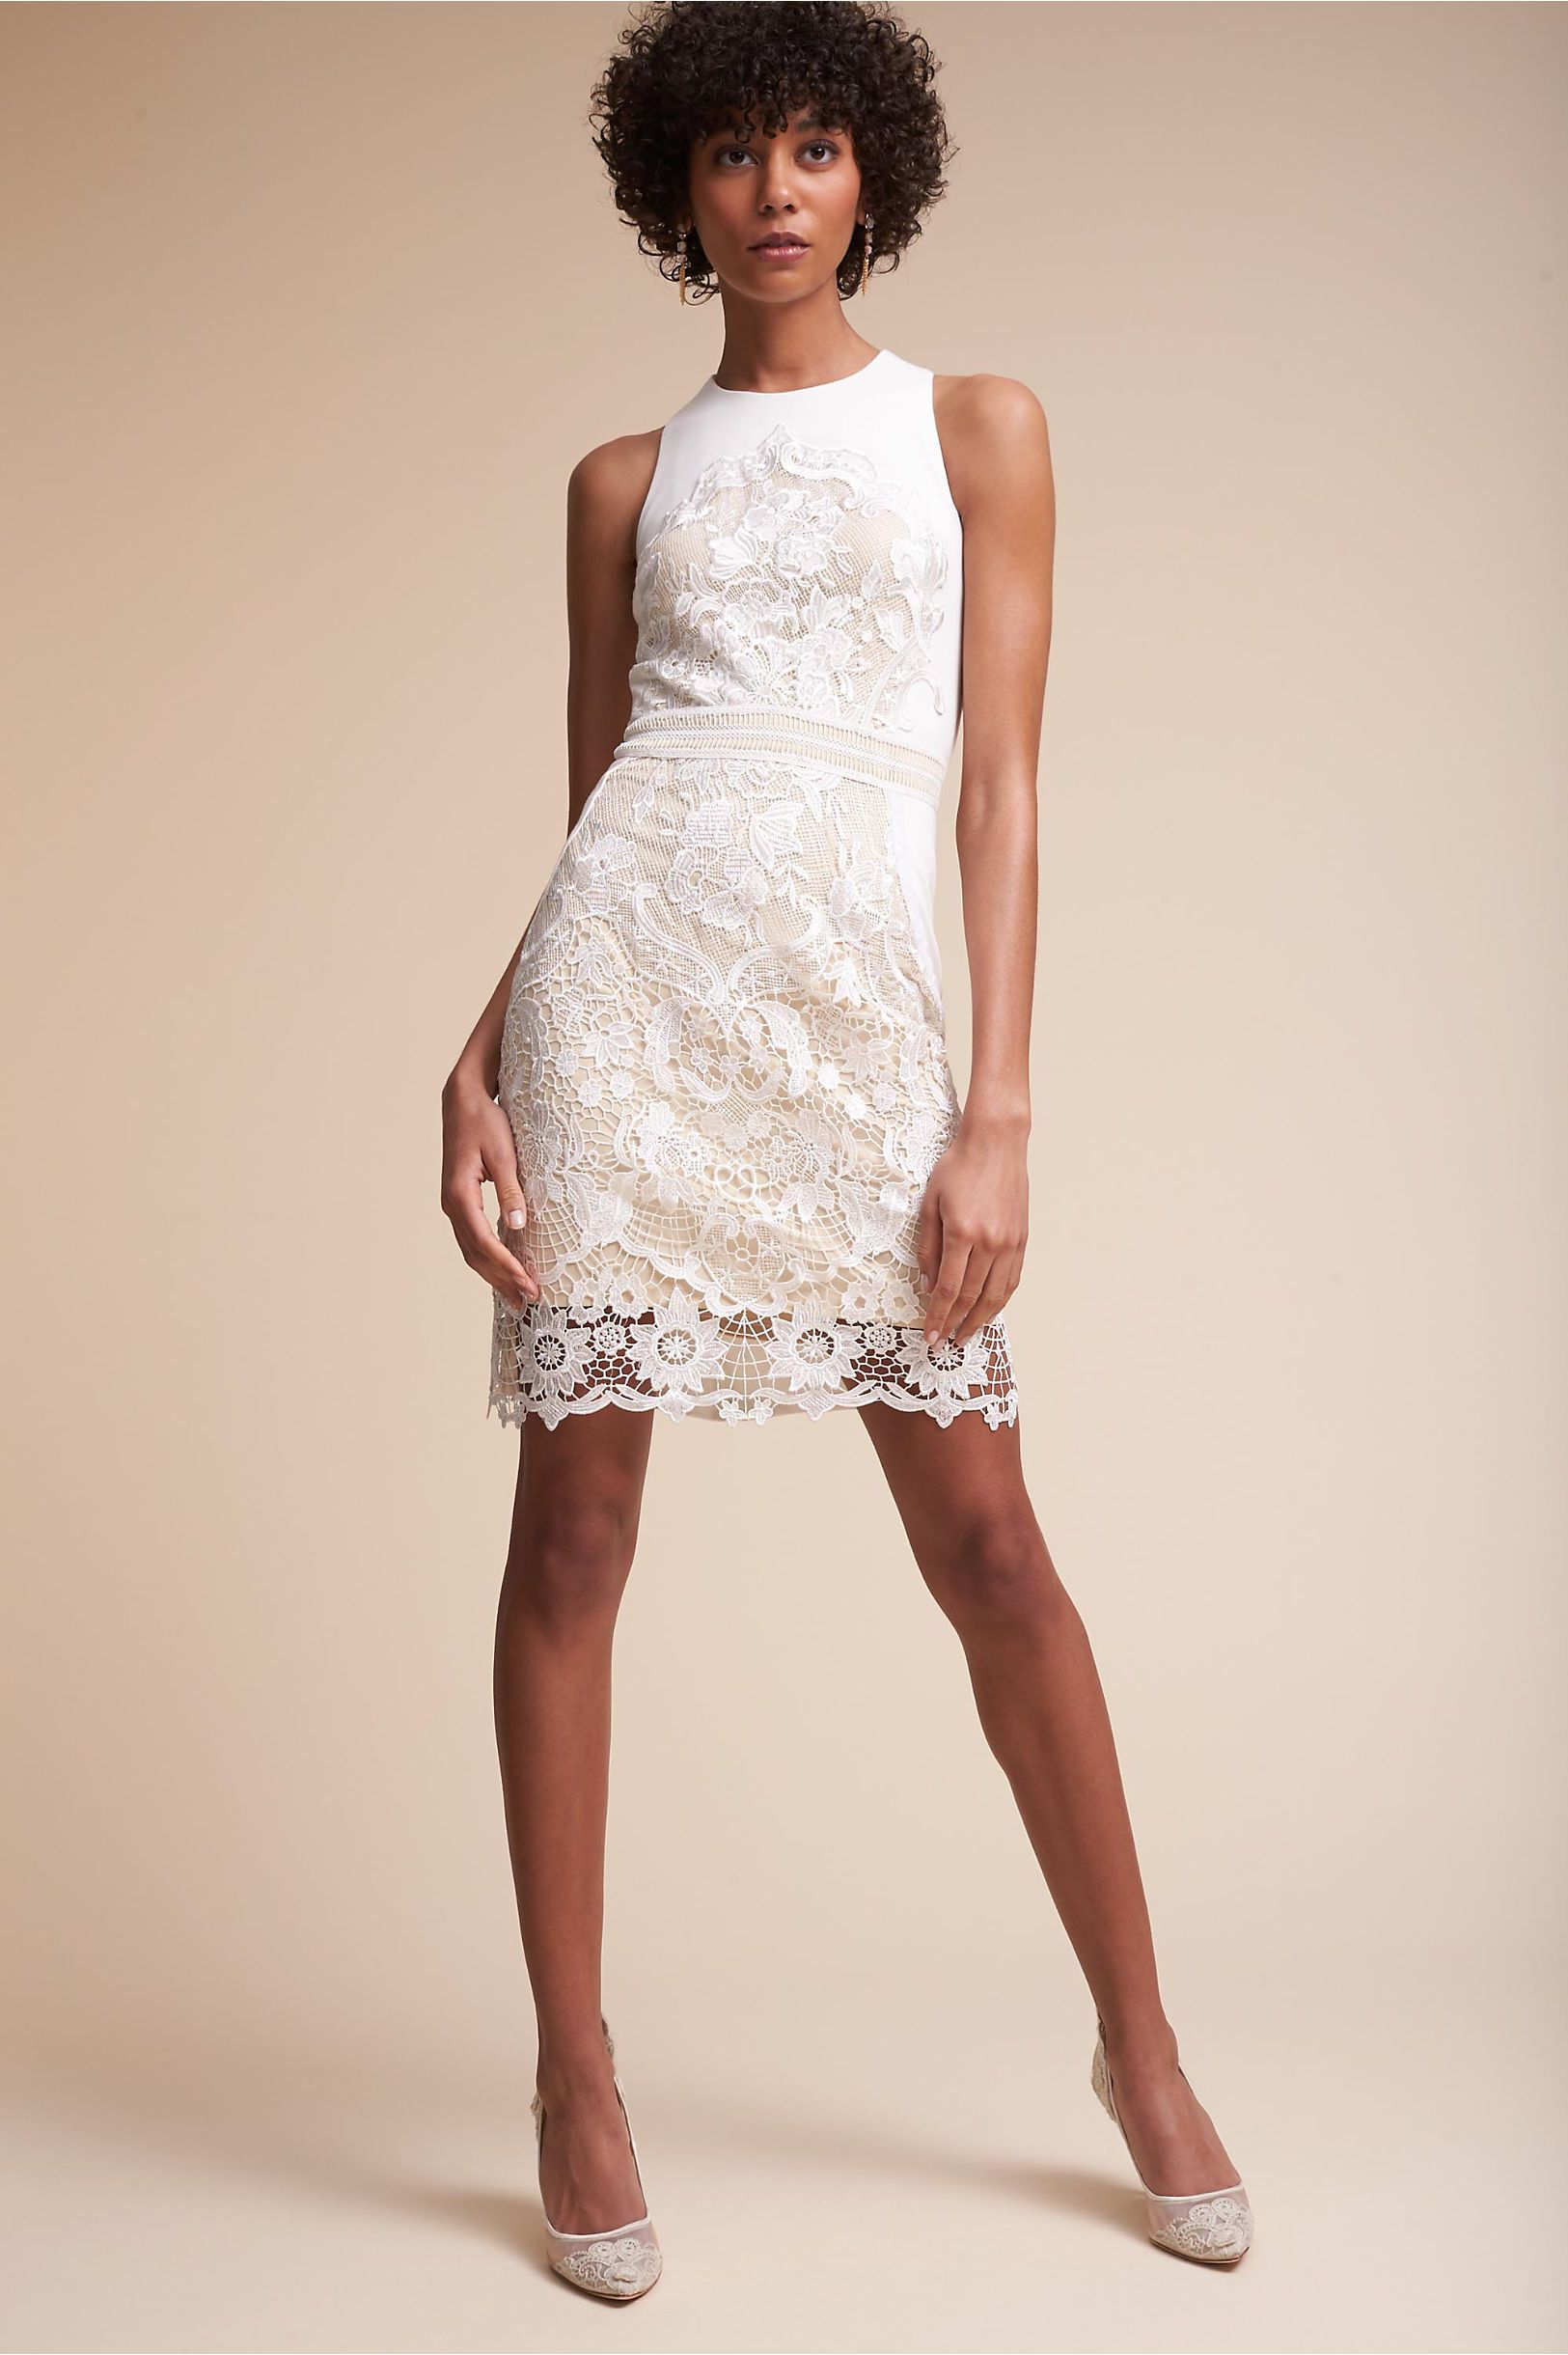 BHLDN\'s James Coviello Ashbury Dress in Ivory/nude | Ivory